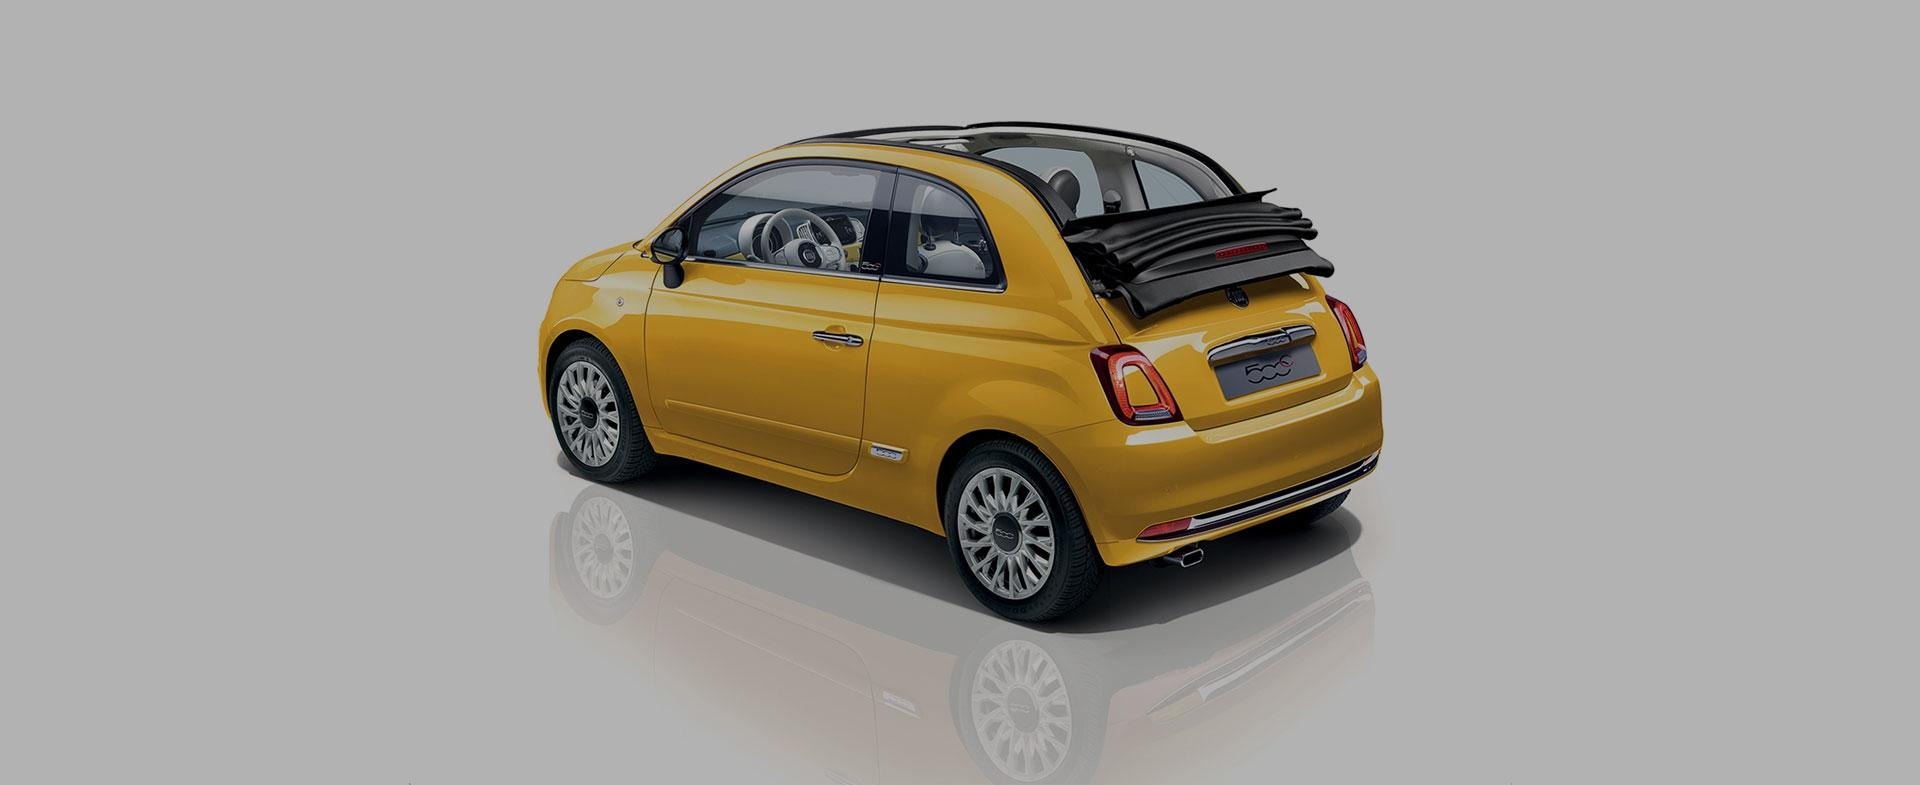 Perrys | Fiat Dealership in Portsmouth